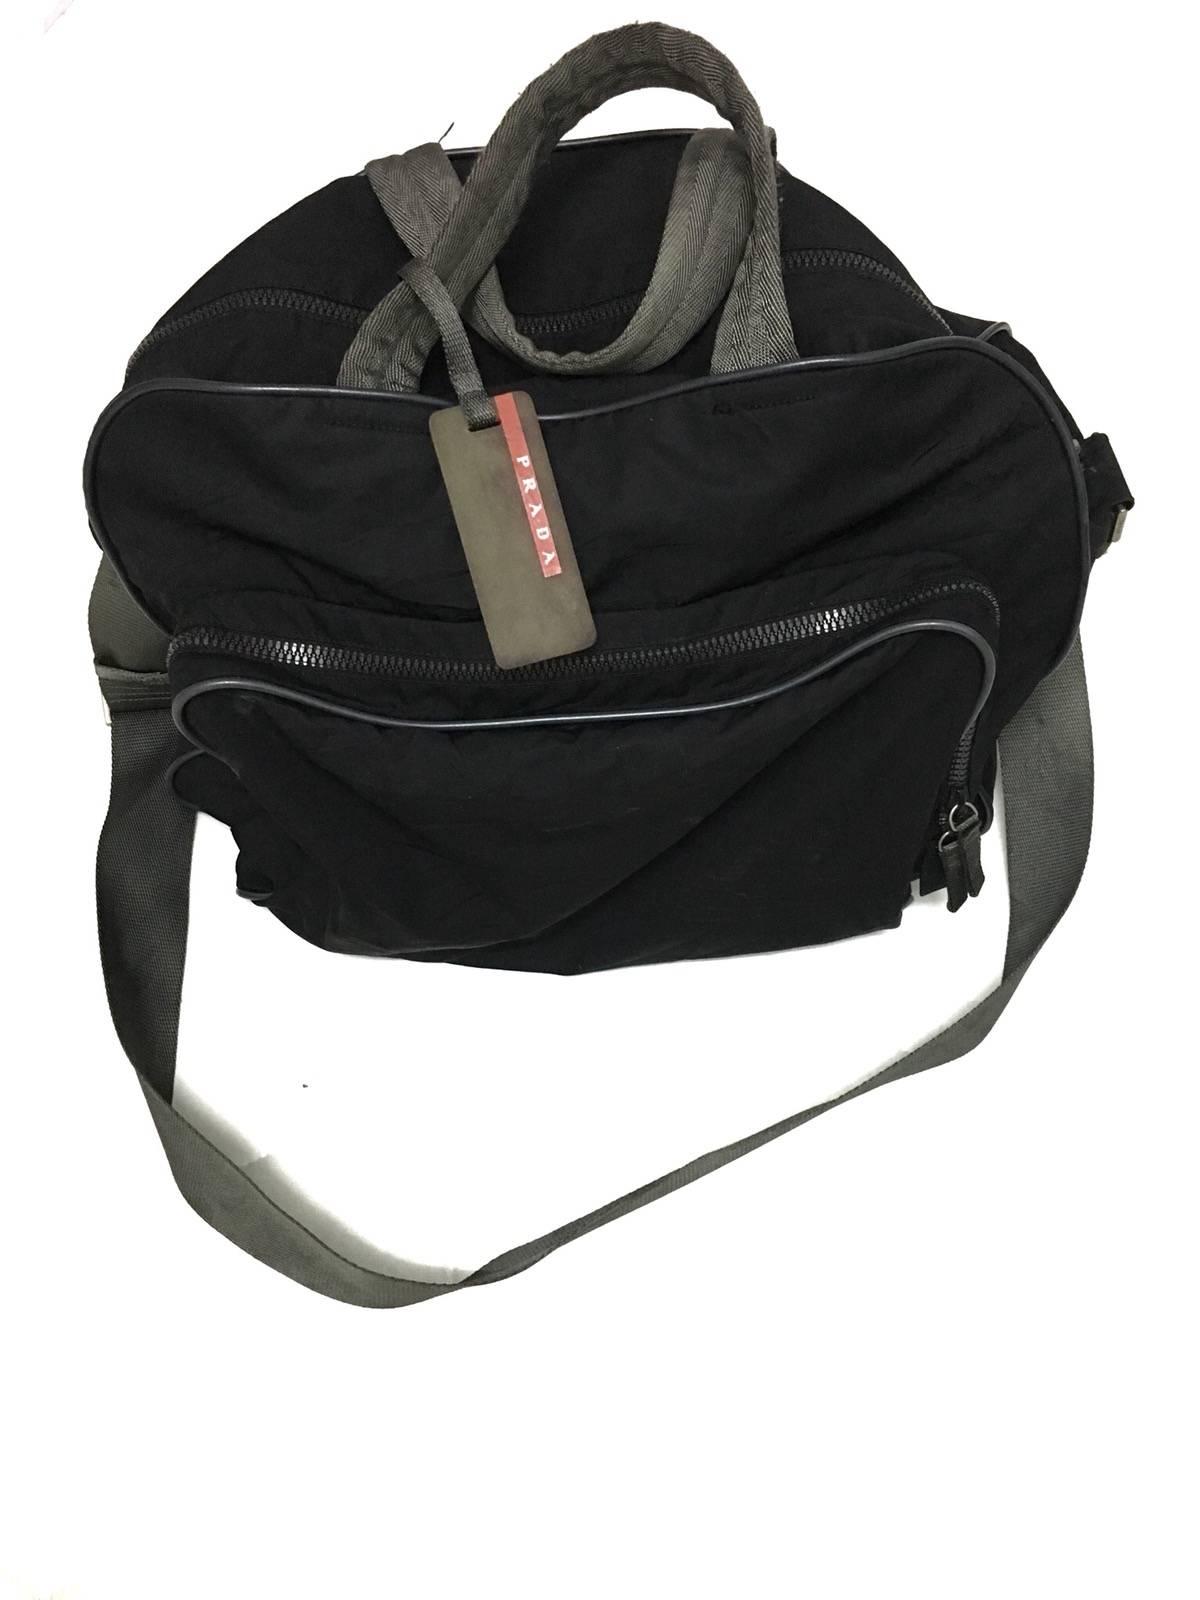 c24b6edf275332 Prada Nylon Travel Bags | The Shred Centre